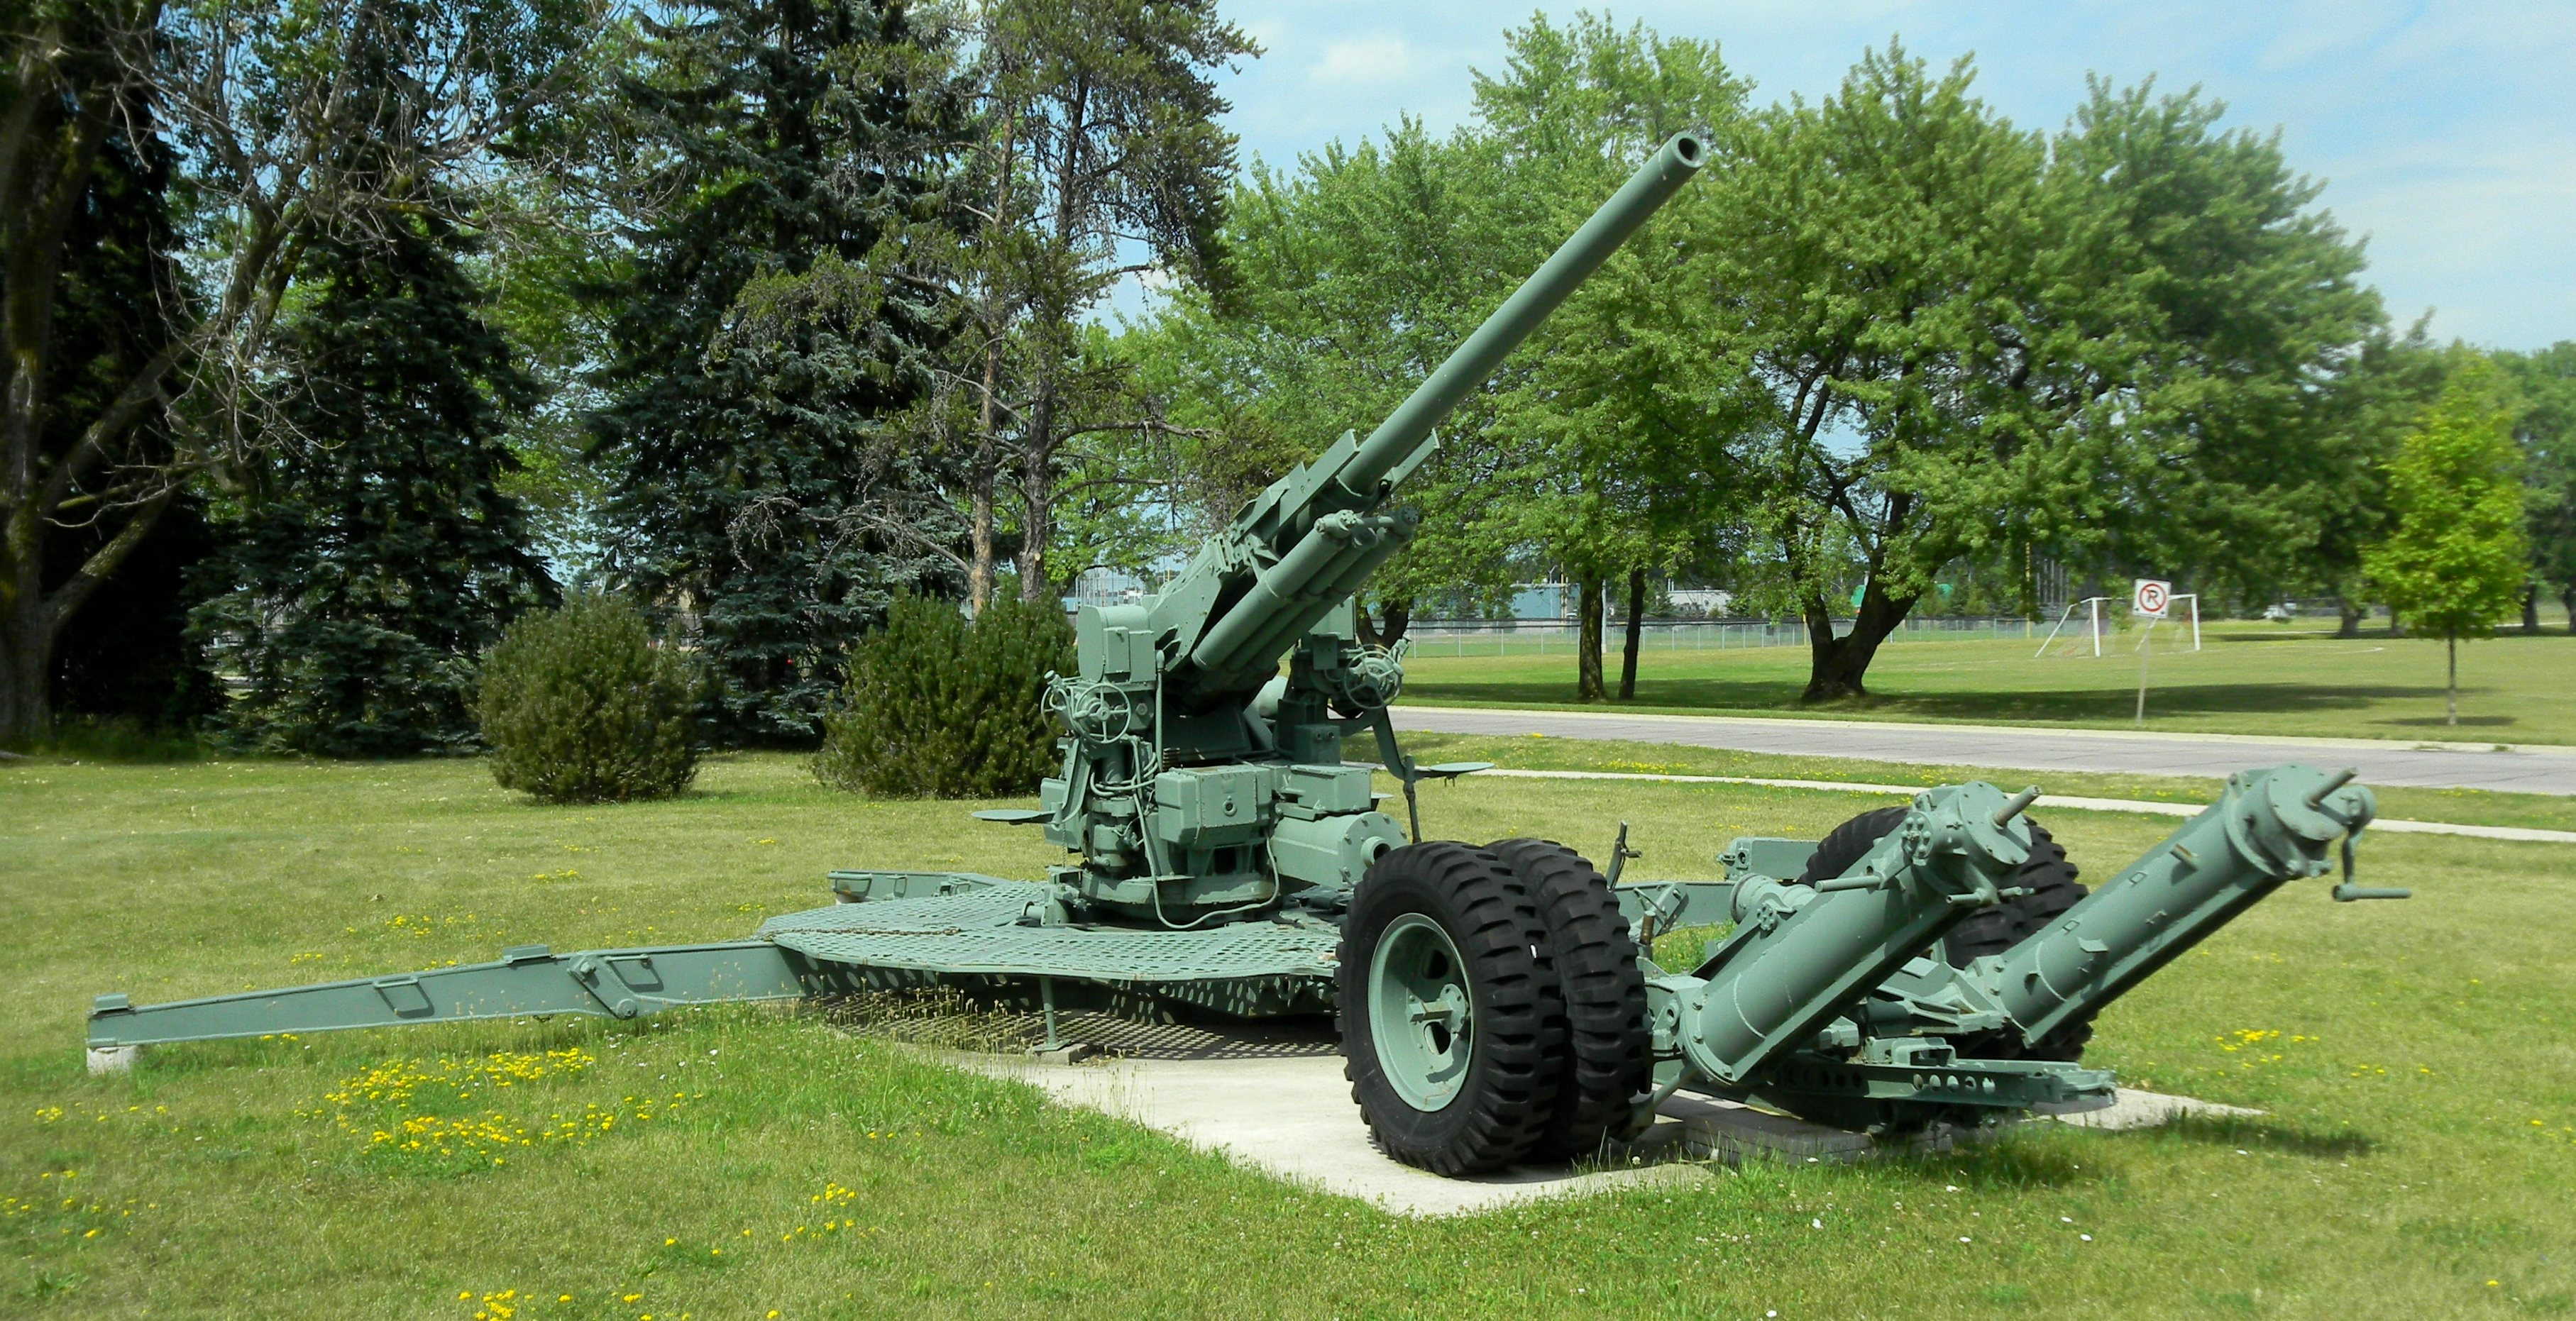 File:M1A2 90 mm AA Gun, CFB Borden, 1 jpg - Wikimedia Commons